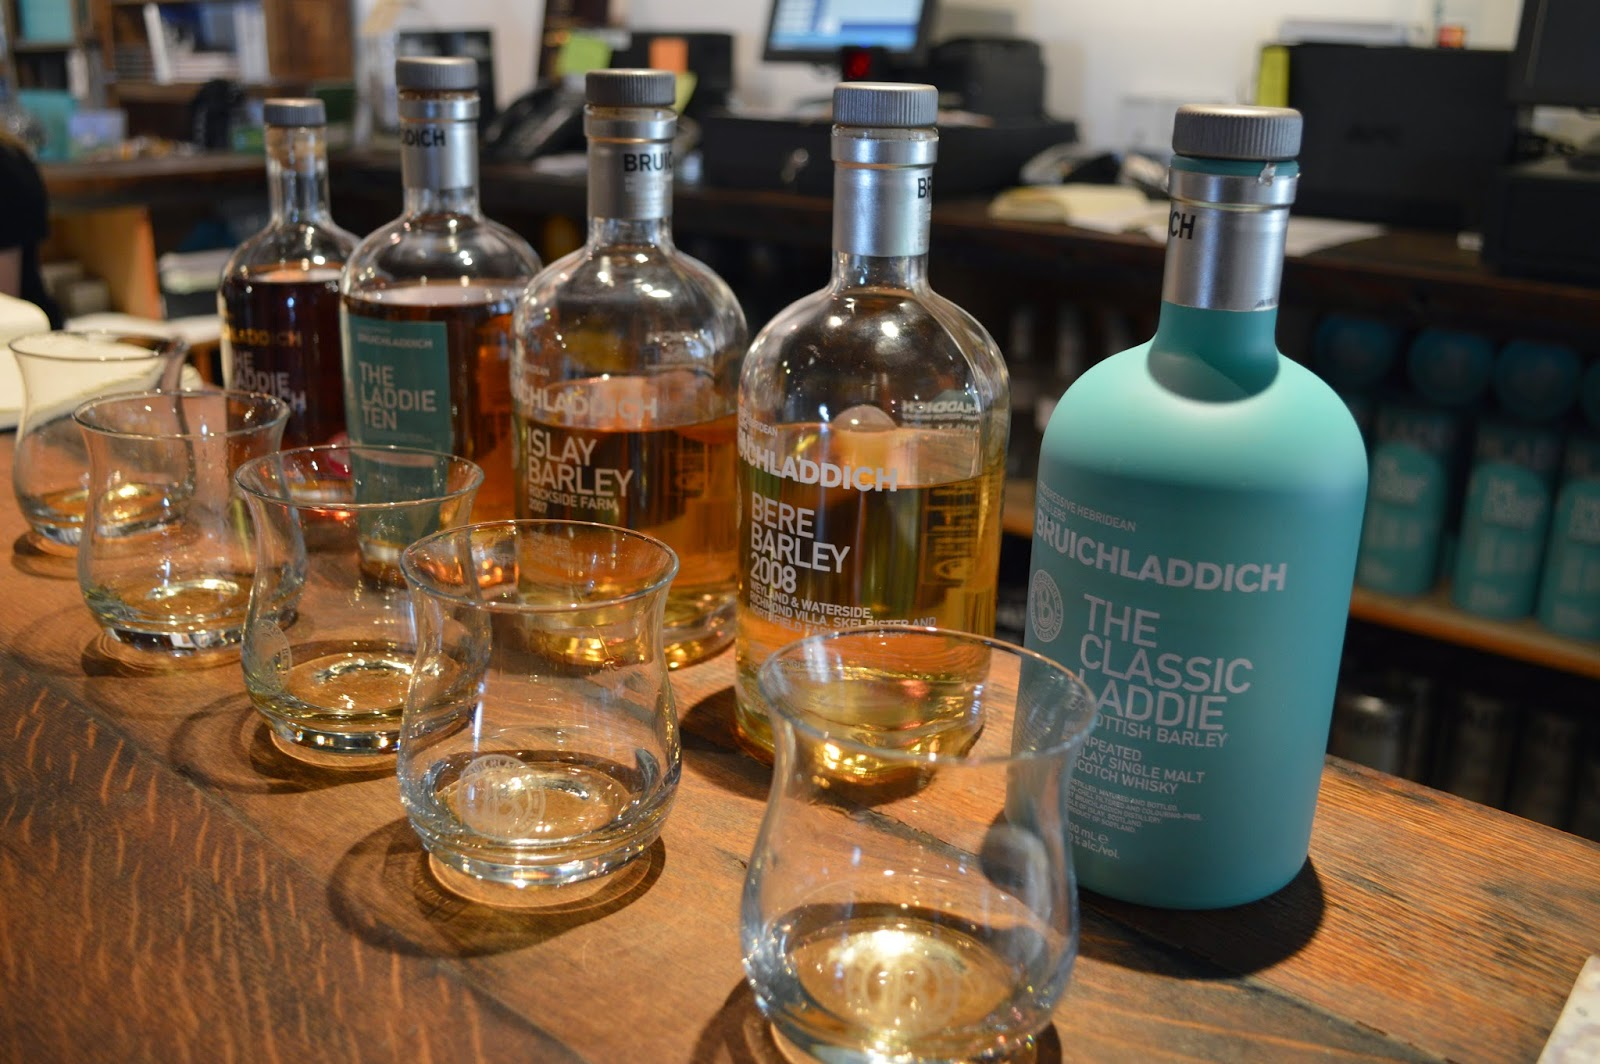 Whisky tasting, Bruichladdich, Islay, Scotland